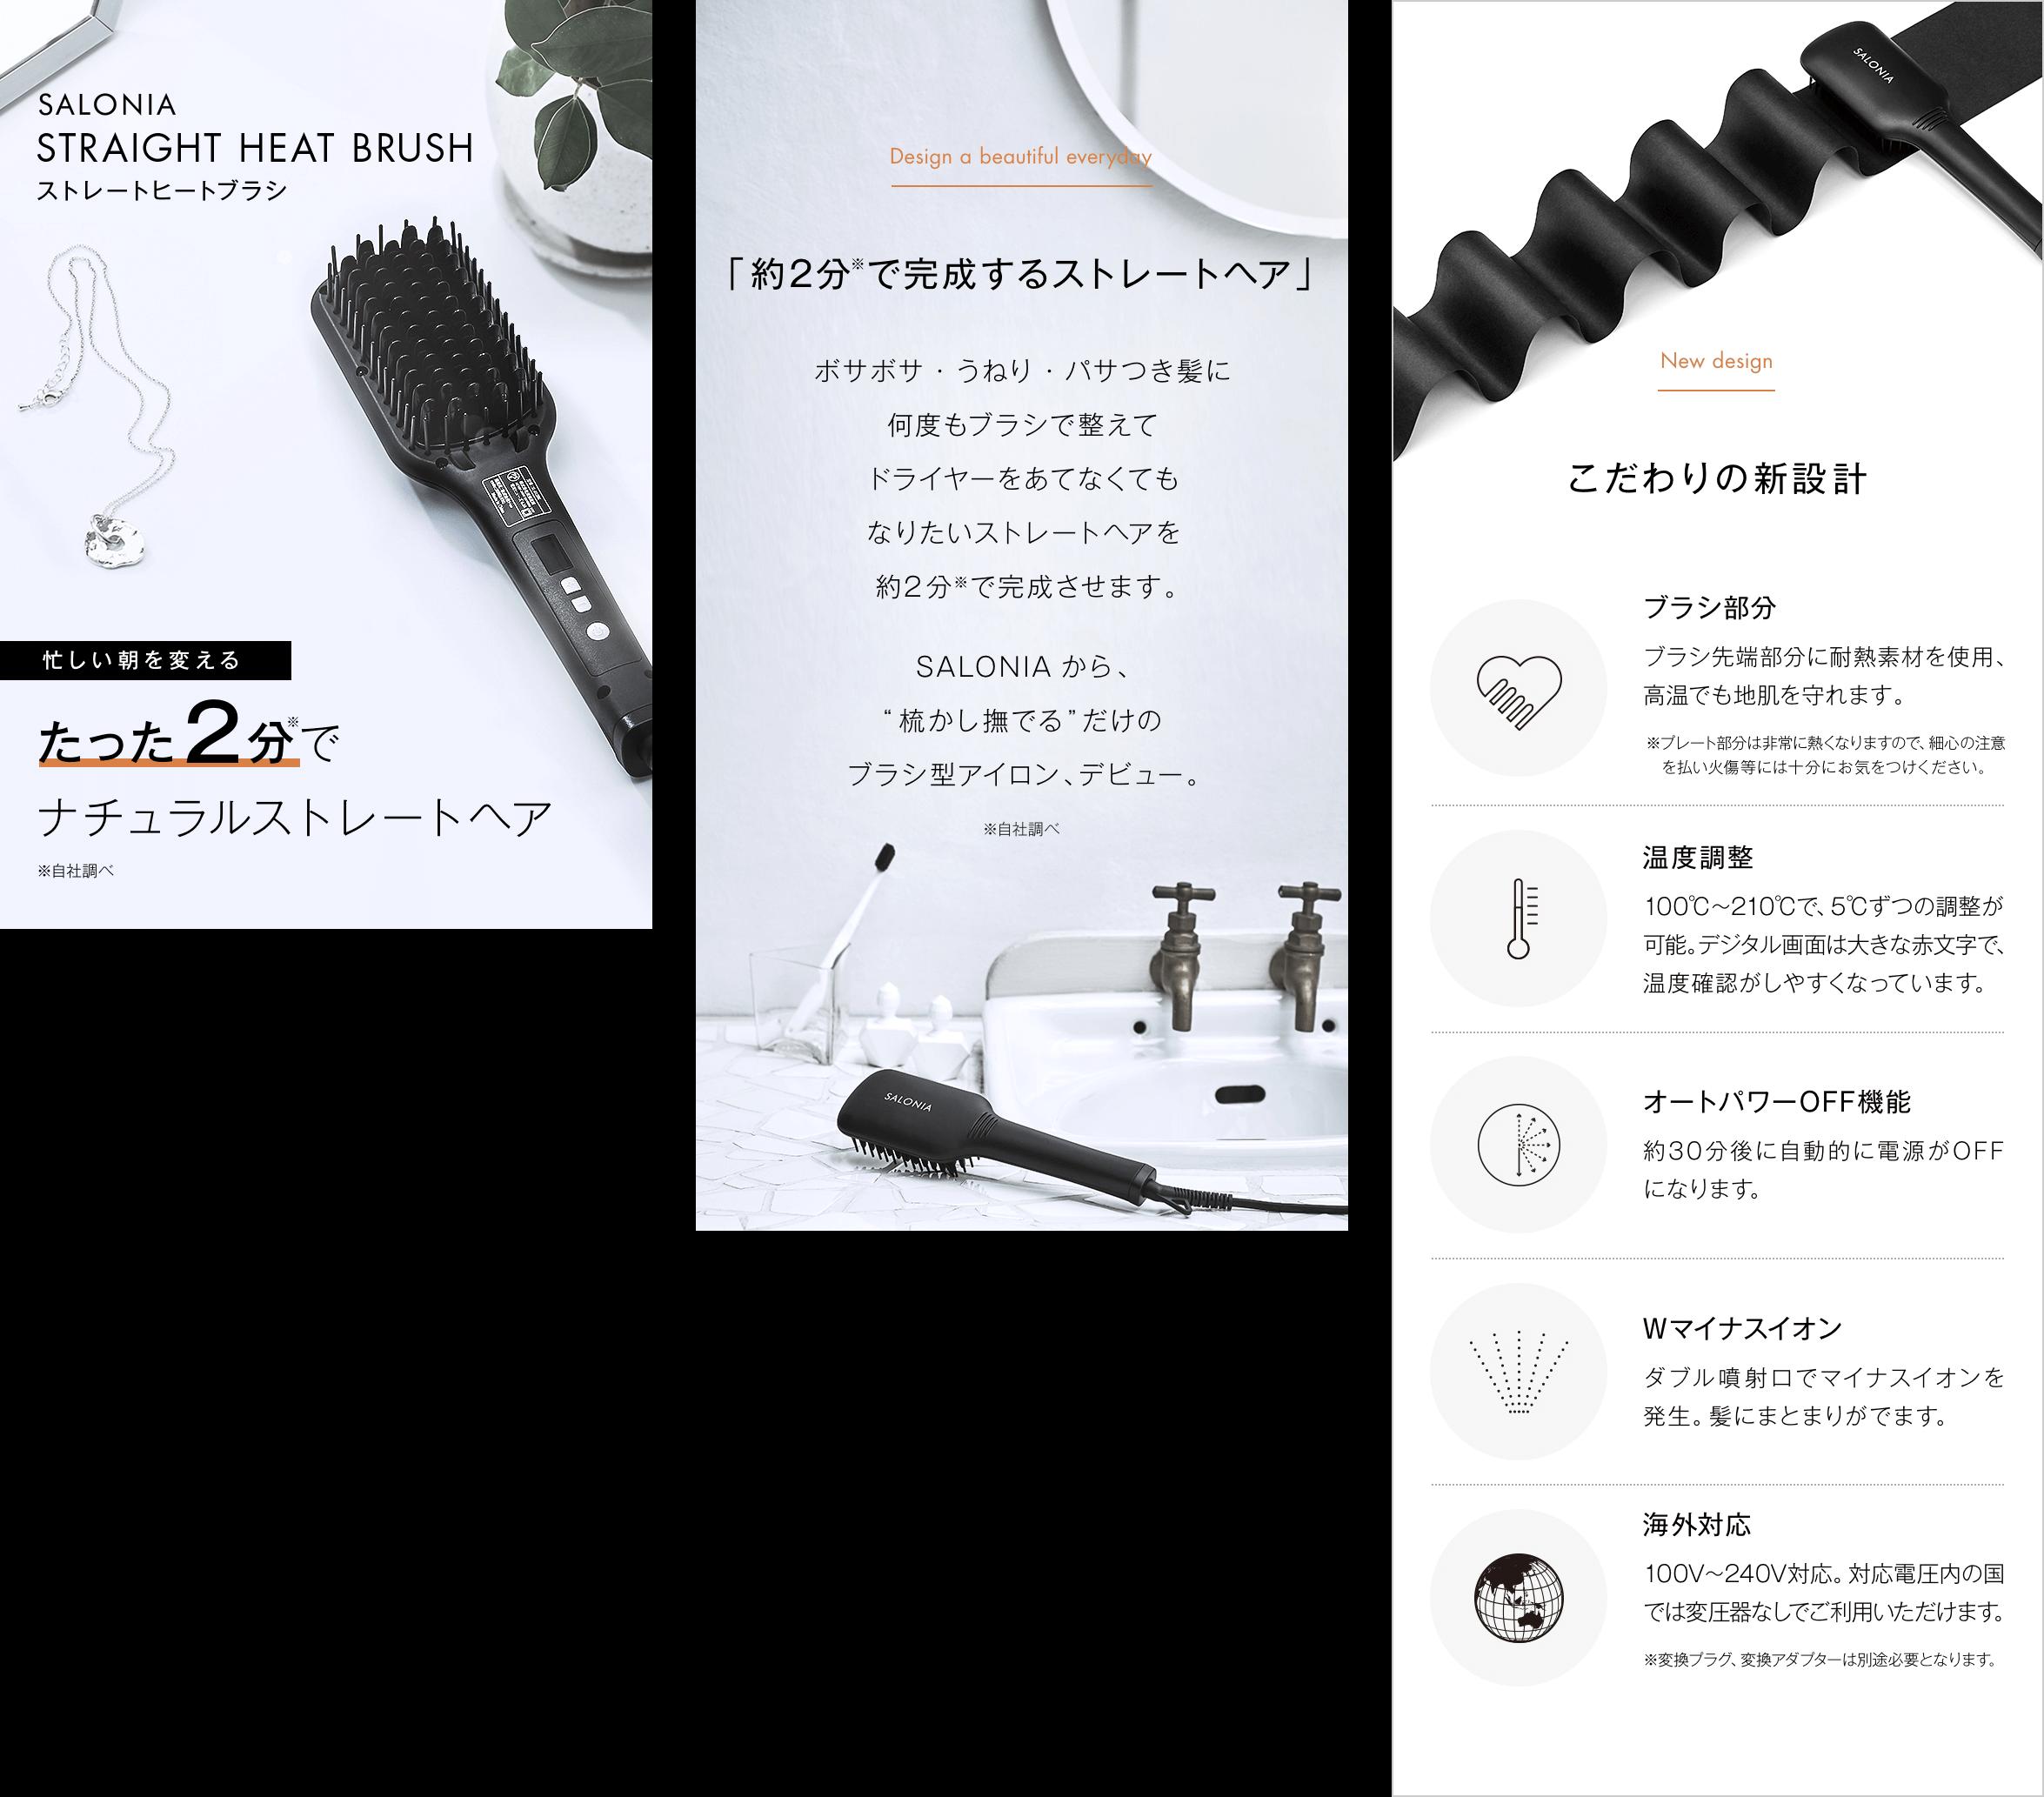 I-ne「SALONIA ヒートブラシ」ランディングページ スマートフォン版